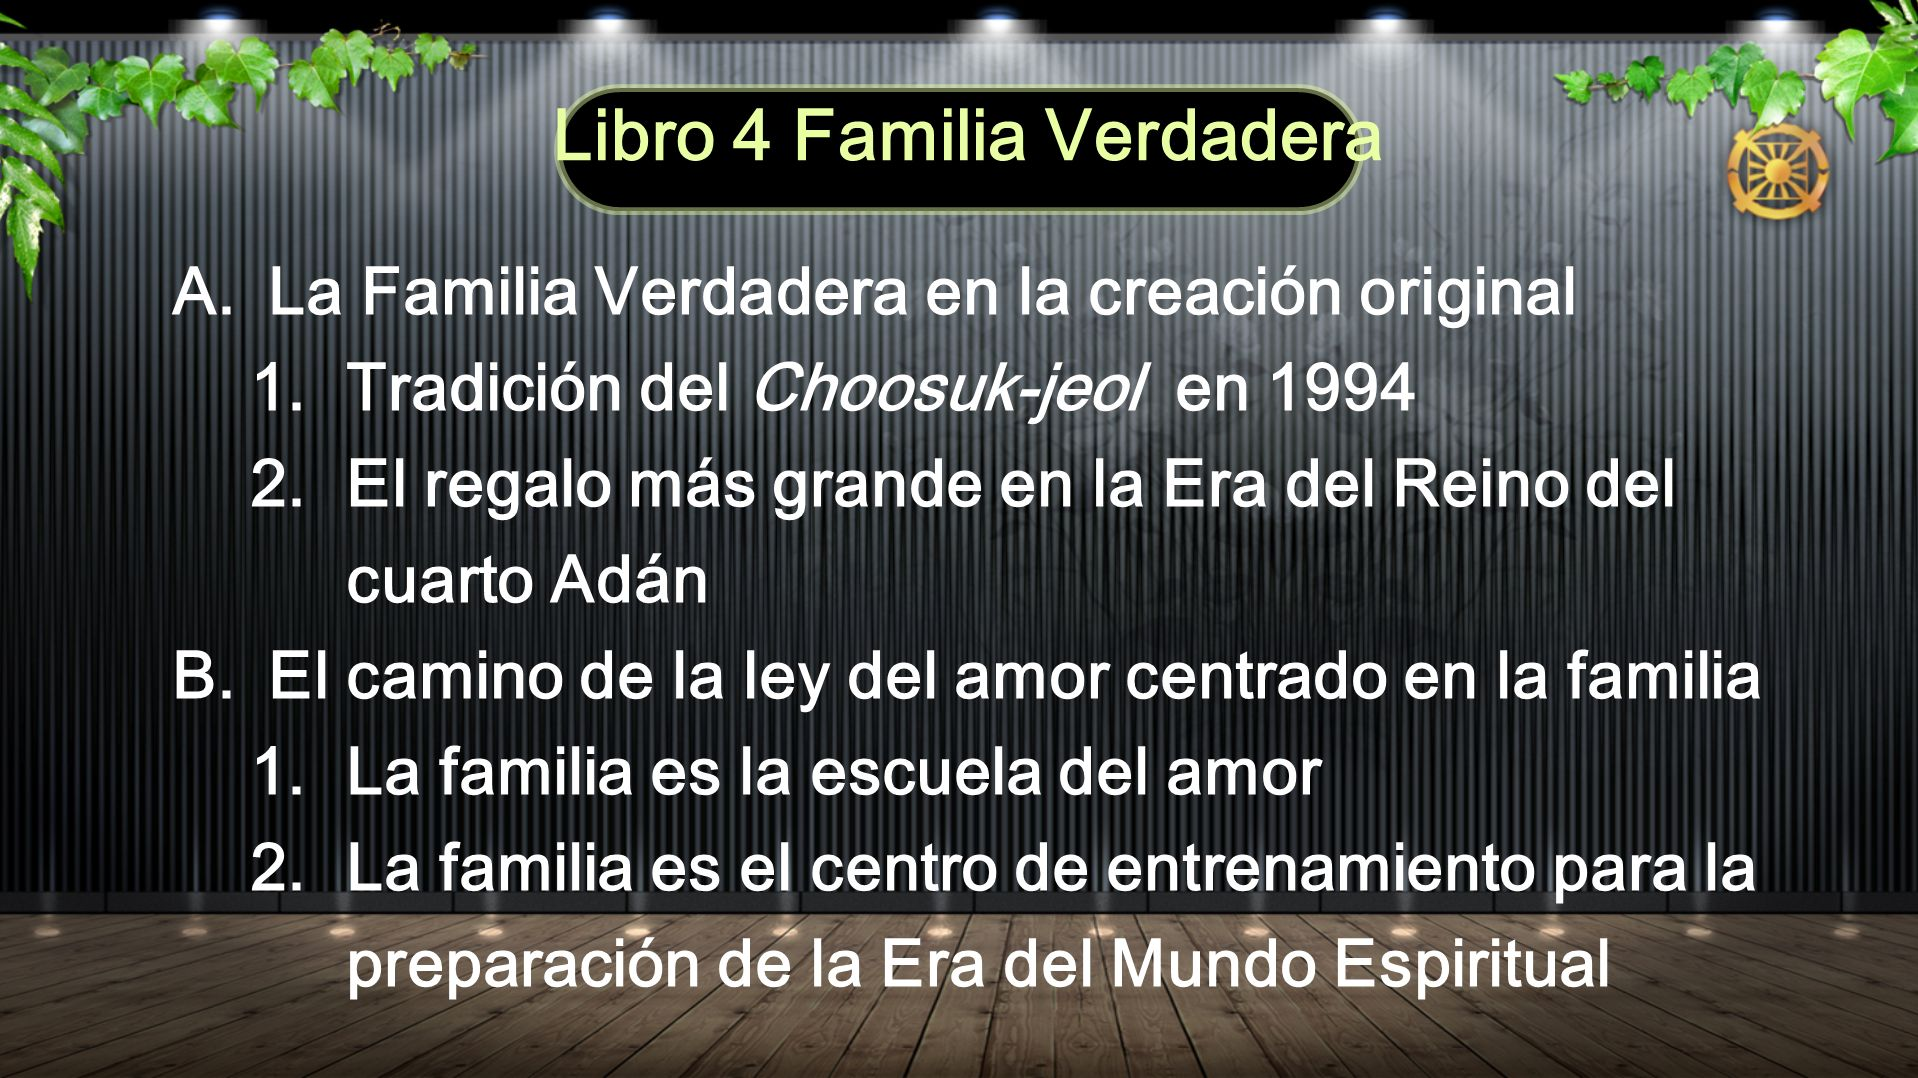 Libro 4 Familia Verdadera